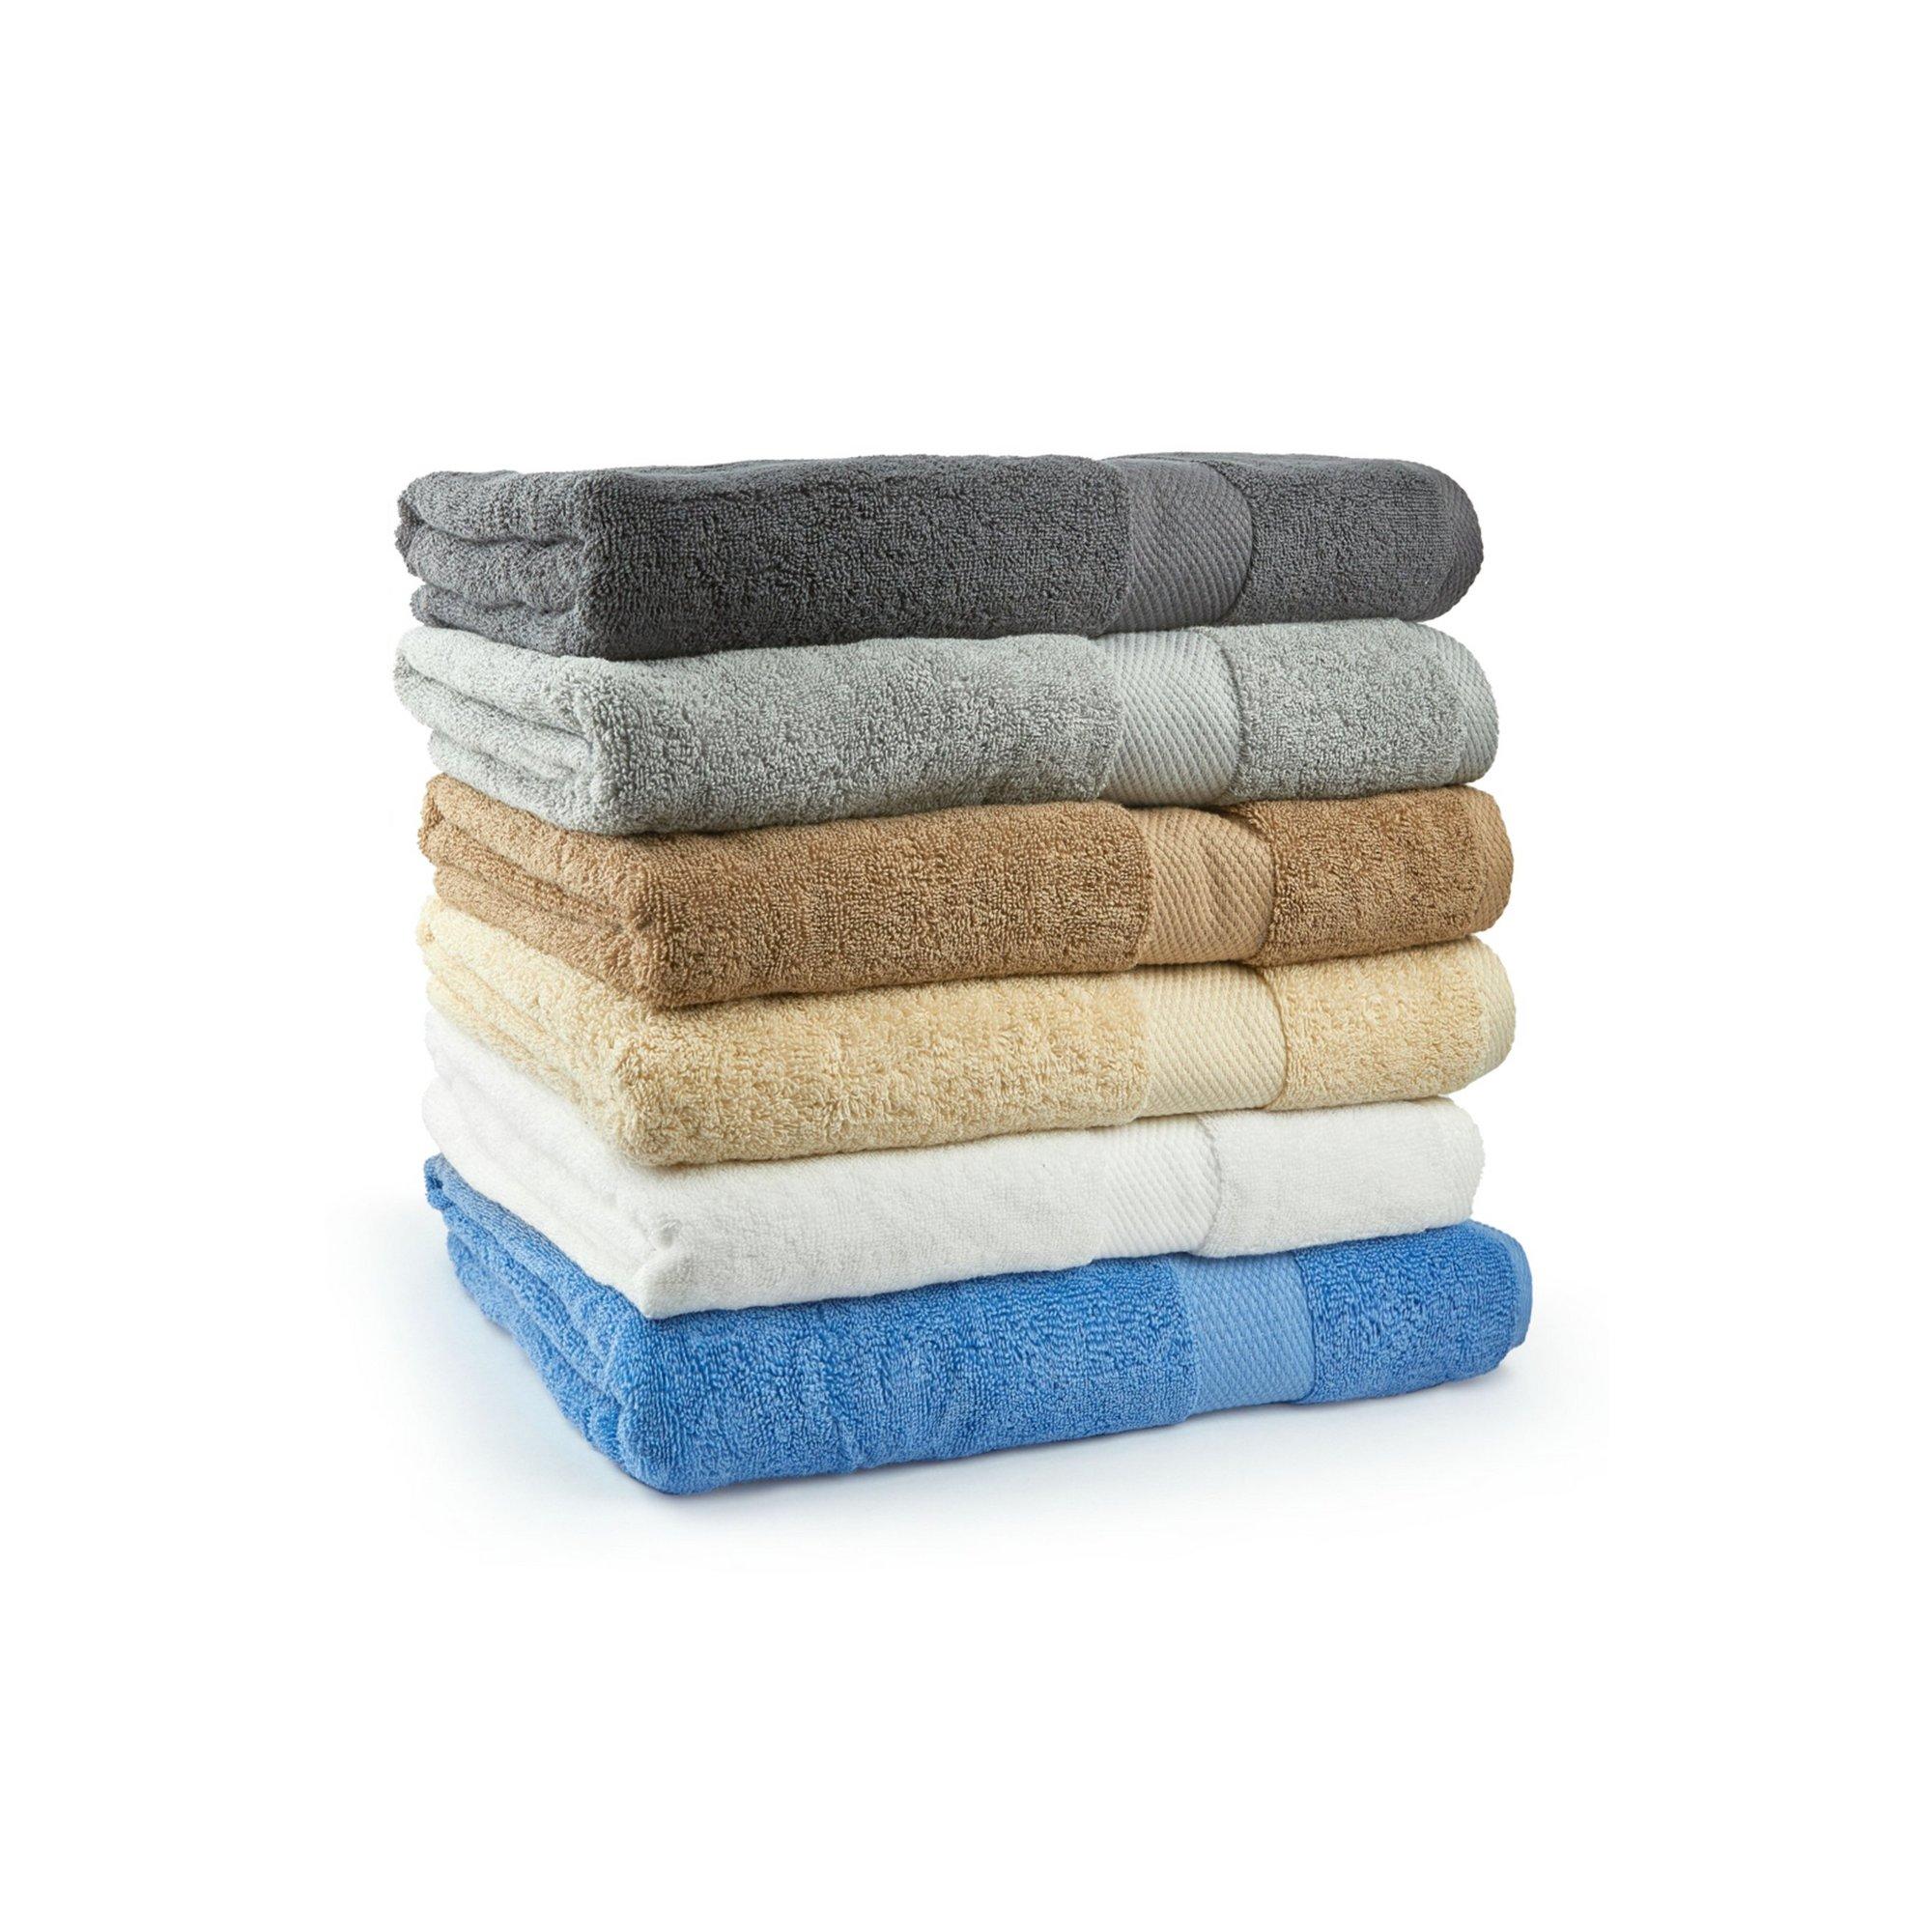 Image of Ascot Plain Dyed 2 Jumbo Bath Sheets